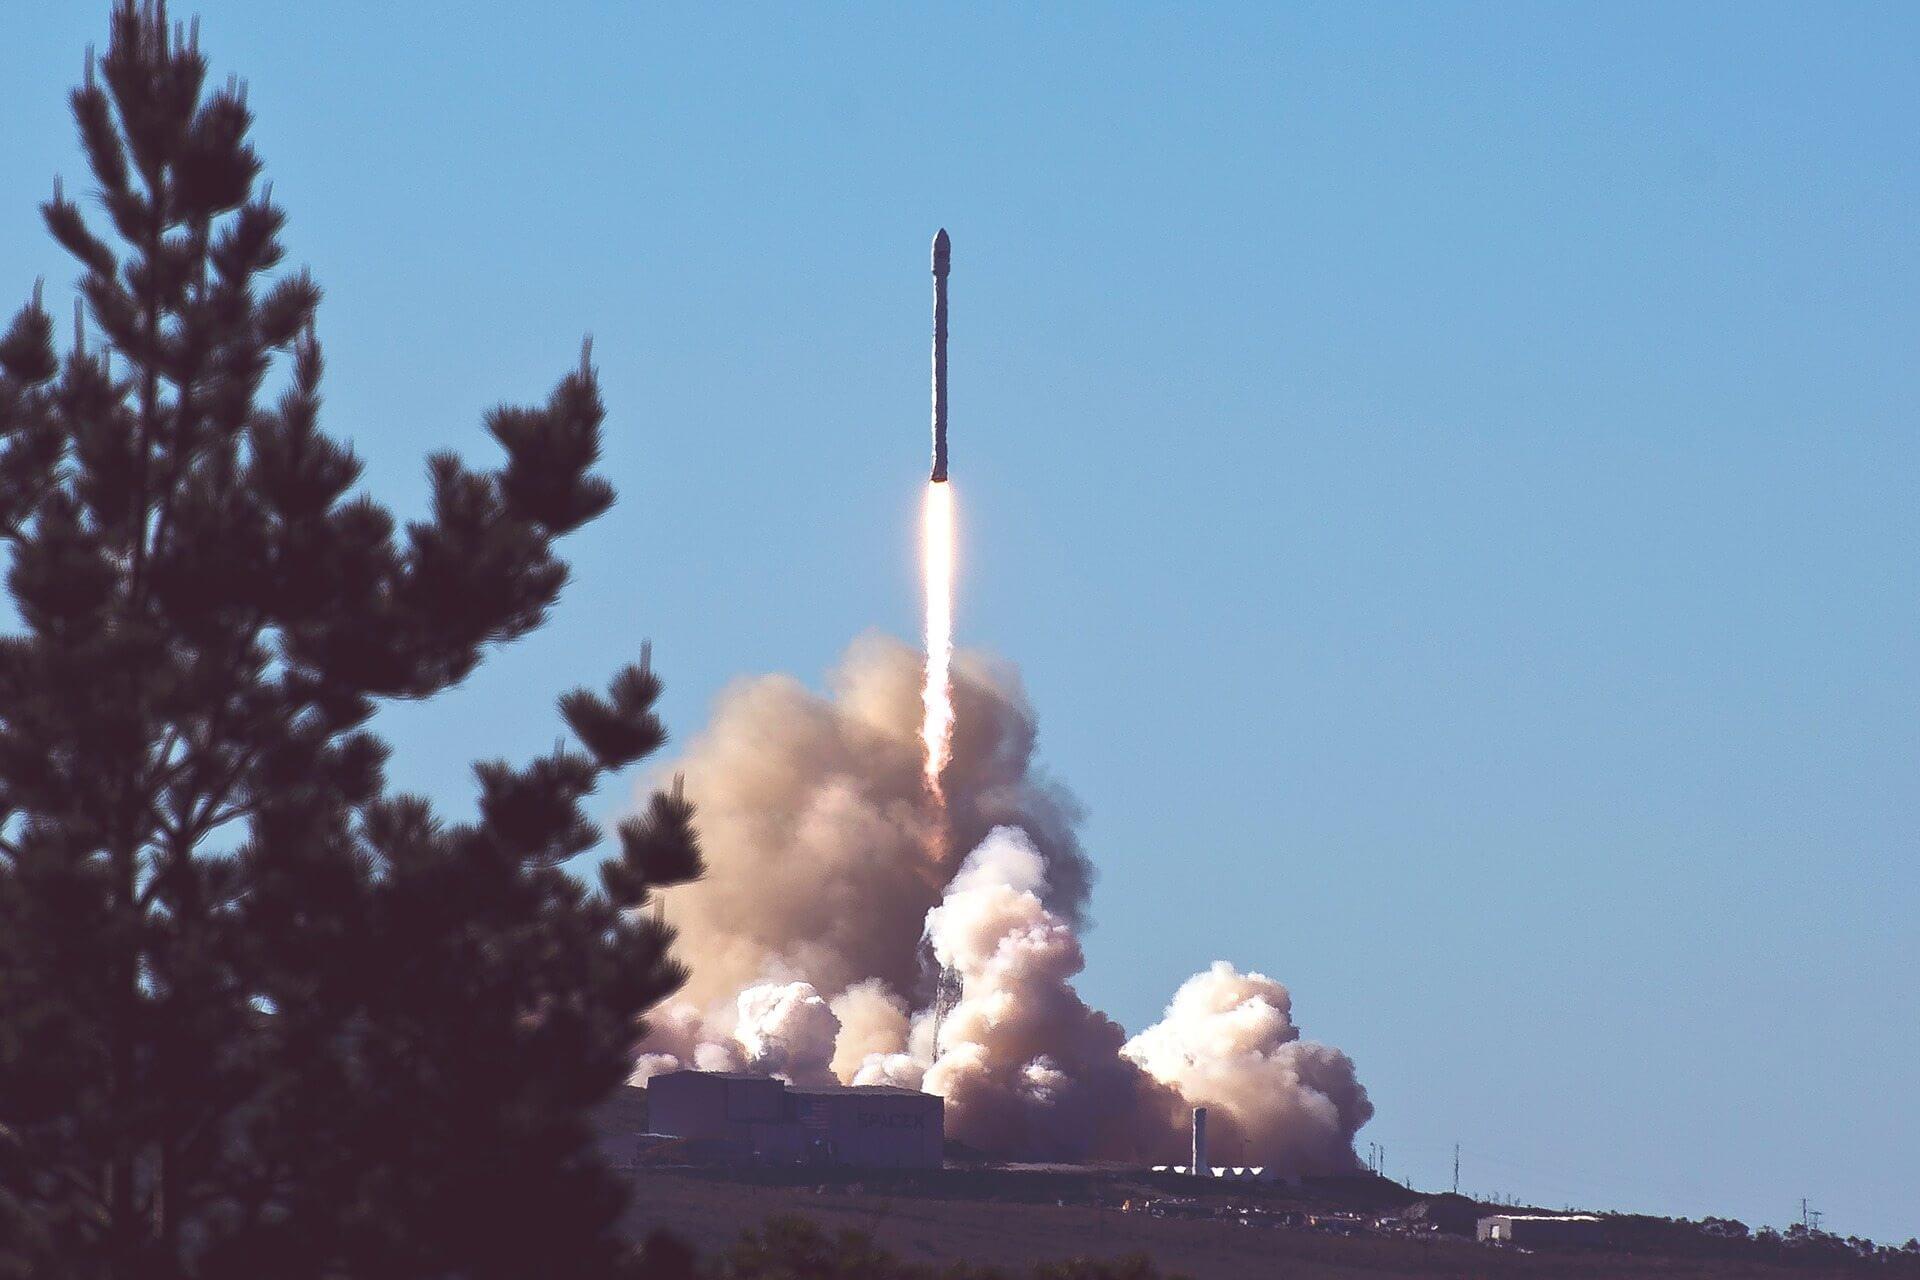 rocket 2587934 1920 - Conheça a 'Muskonomics' - A estratégia econômica de Elon Musk